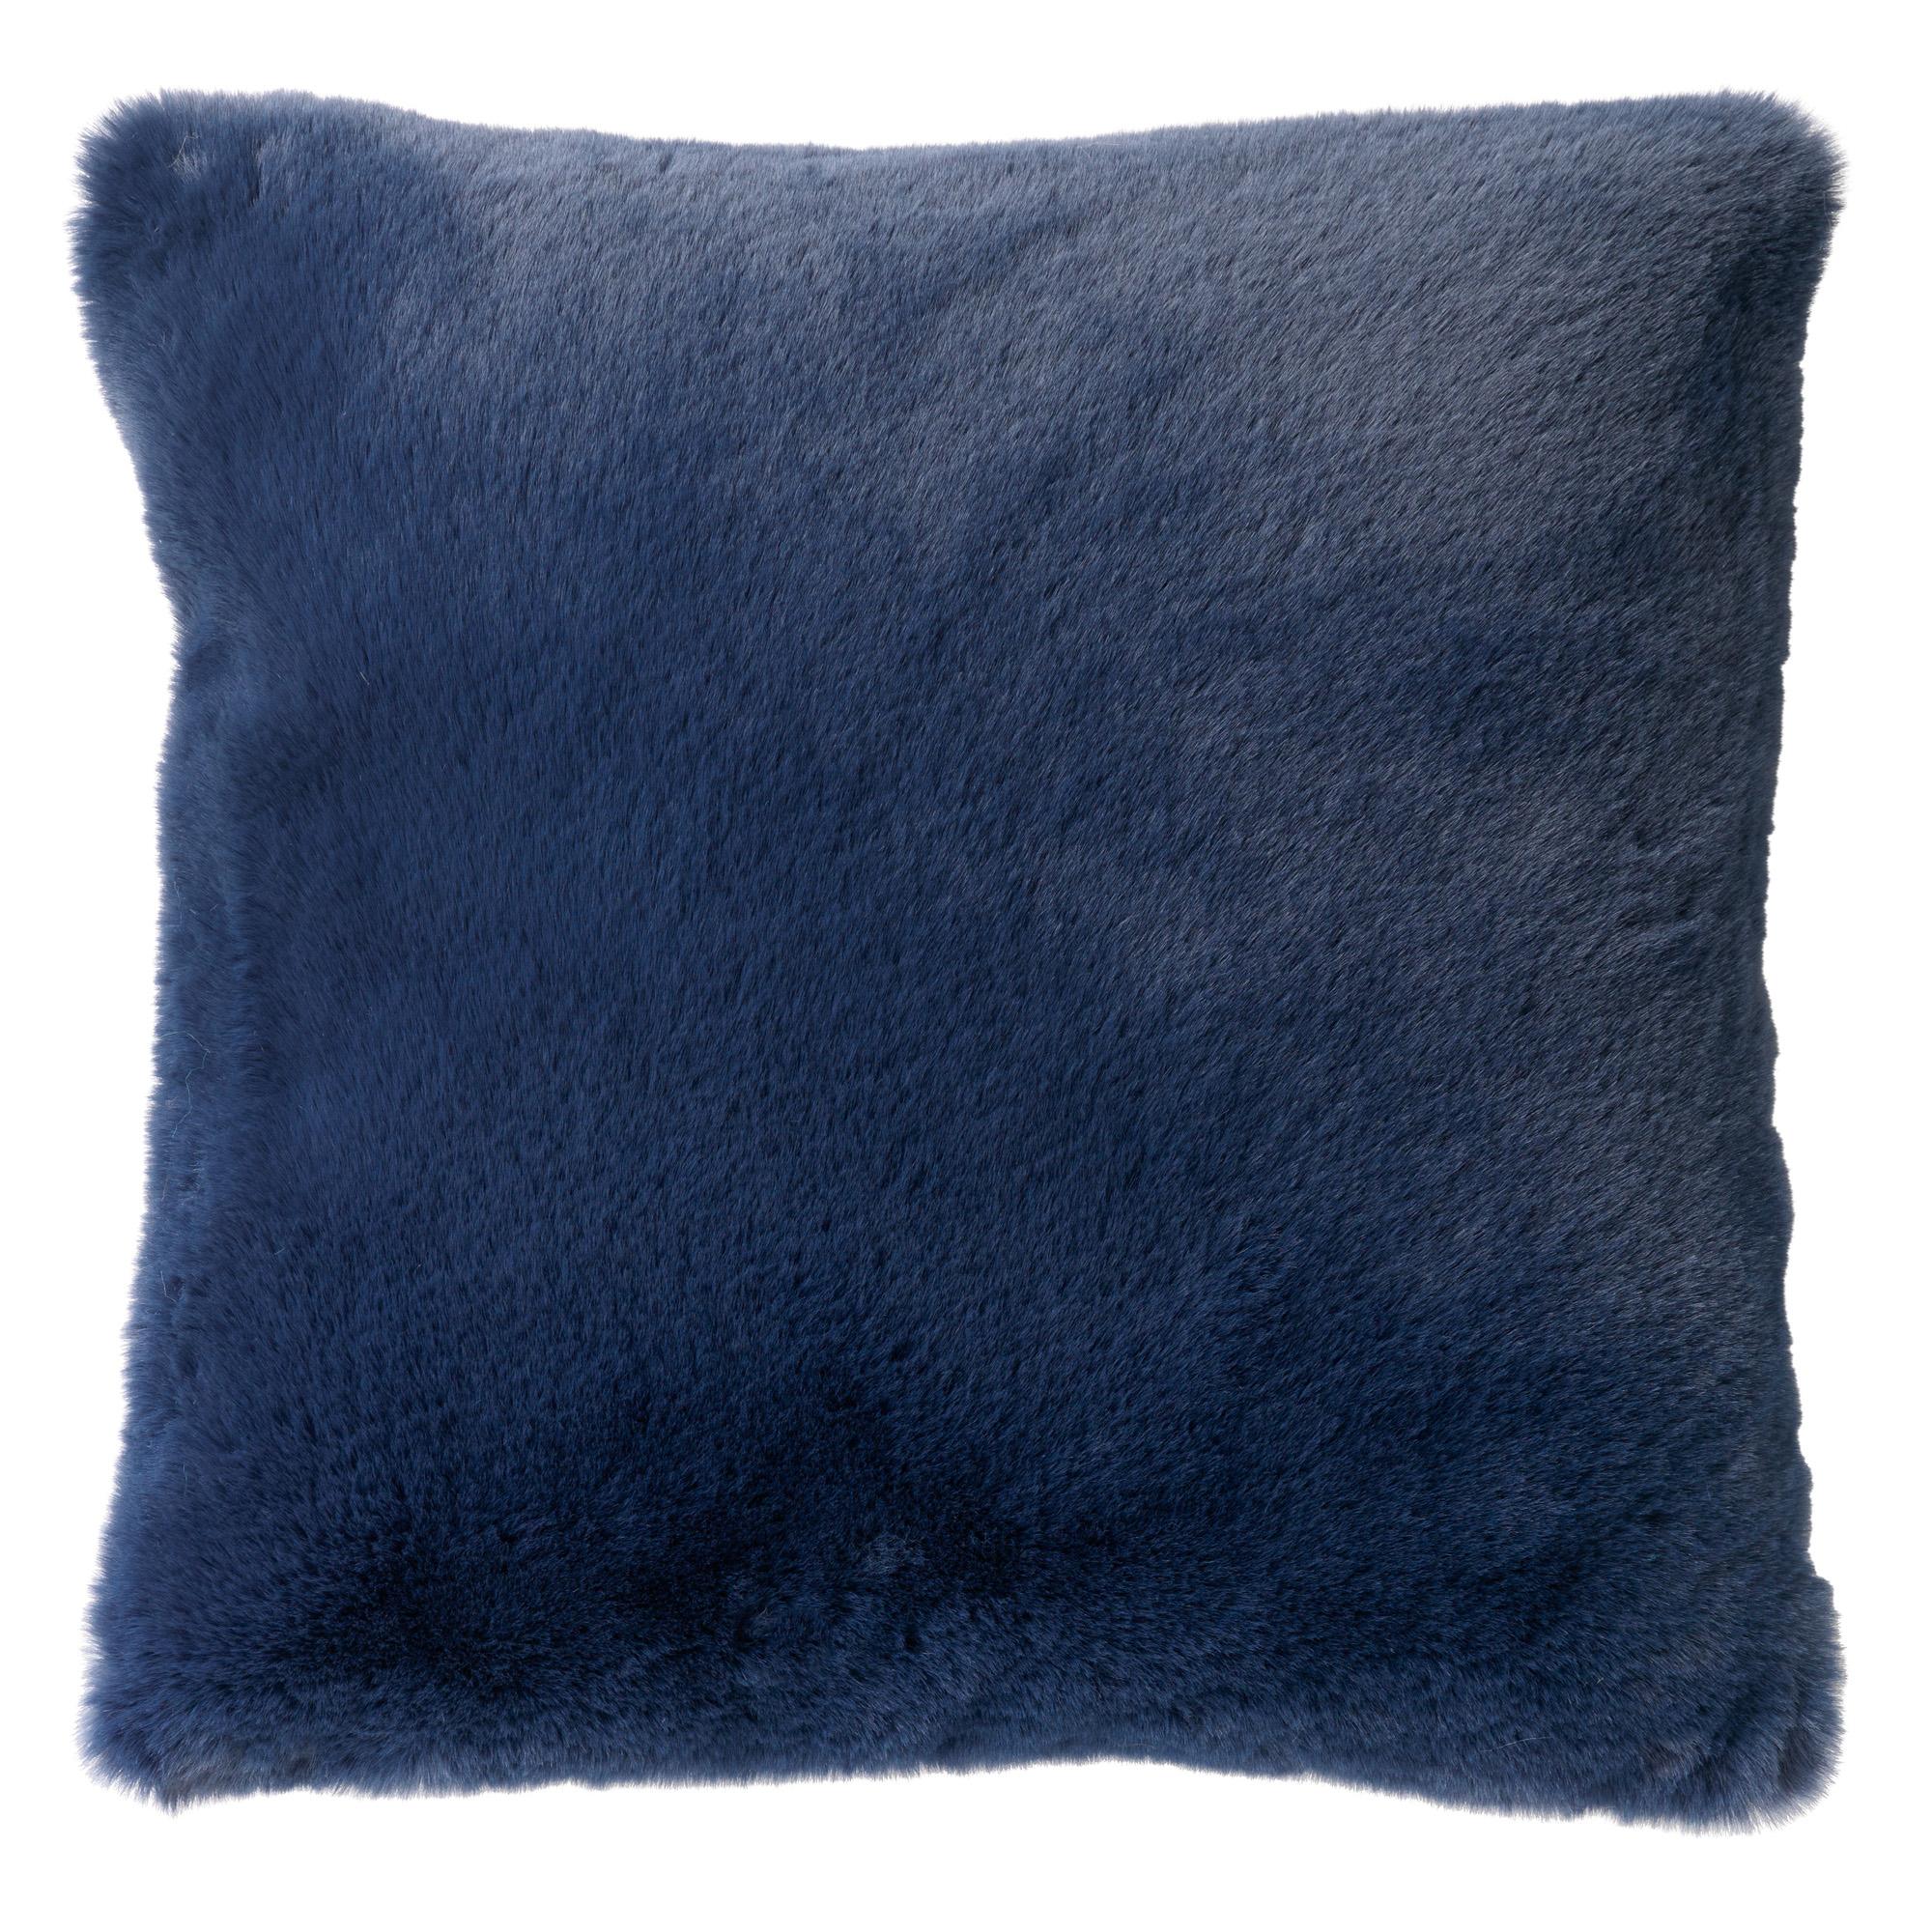 Coussin imitation fourrure Bleu saphir 45x45